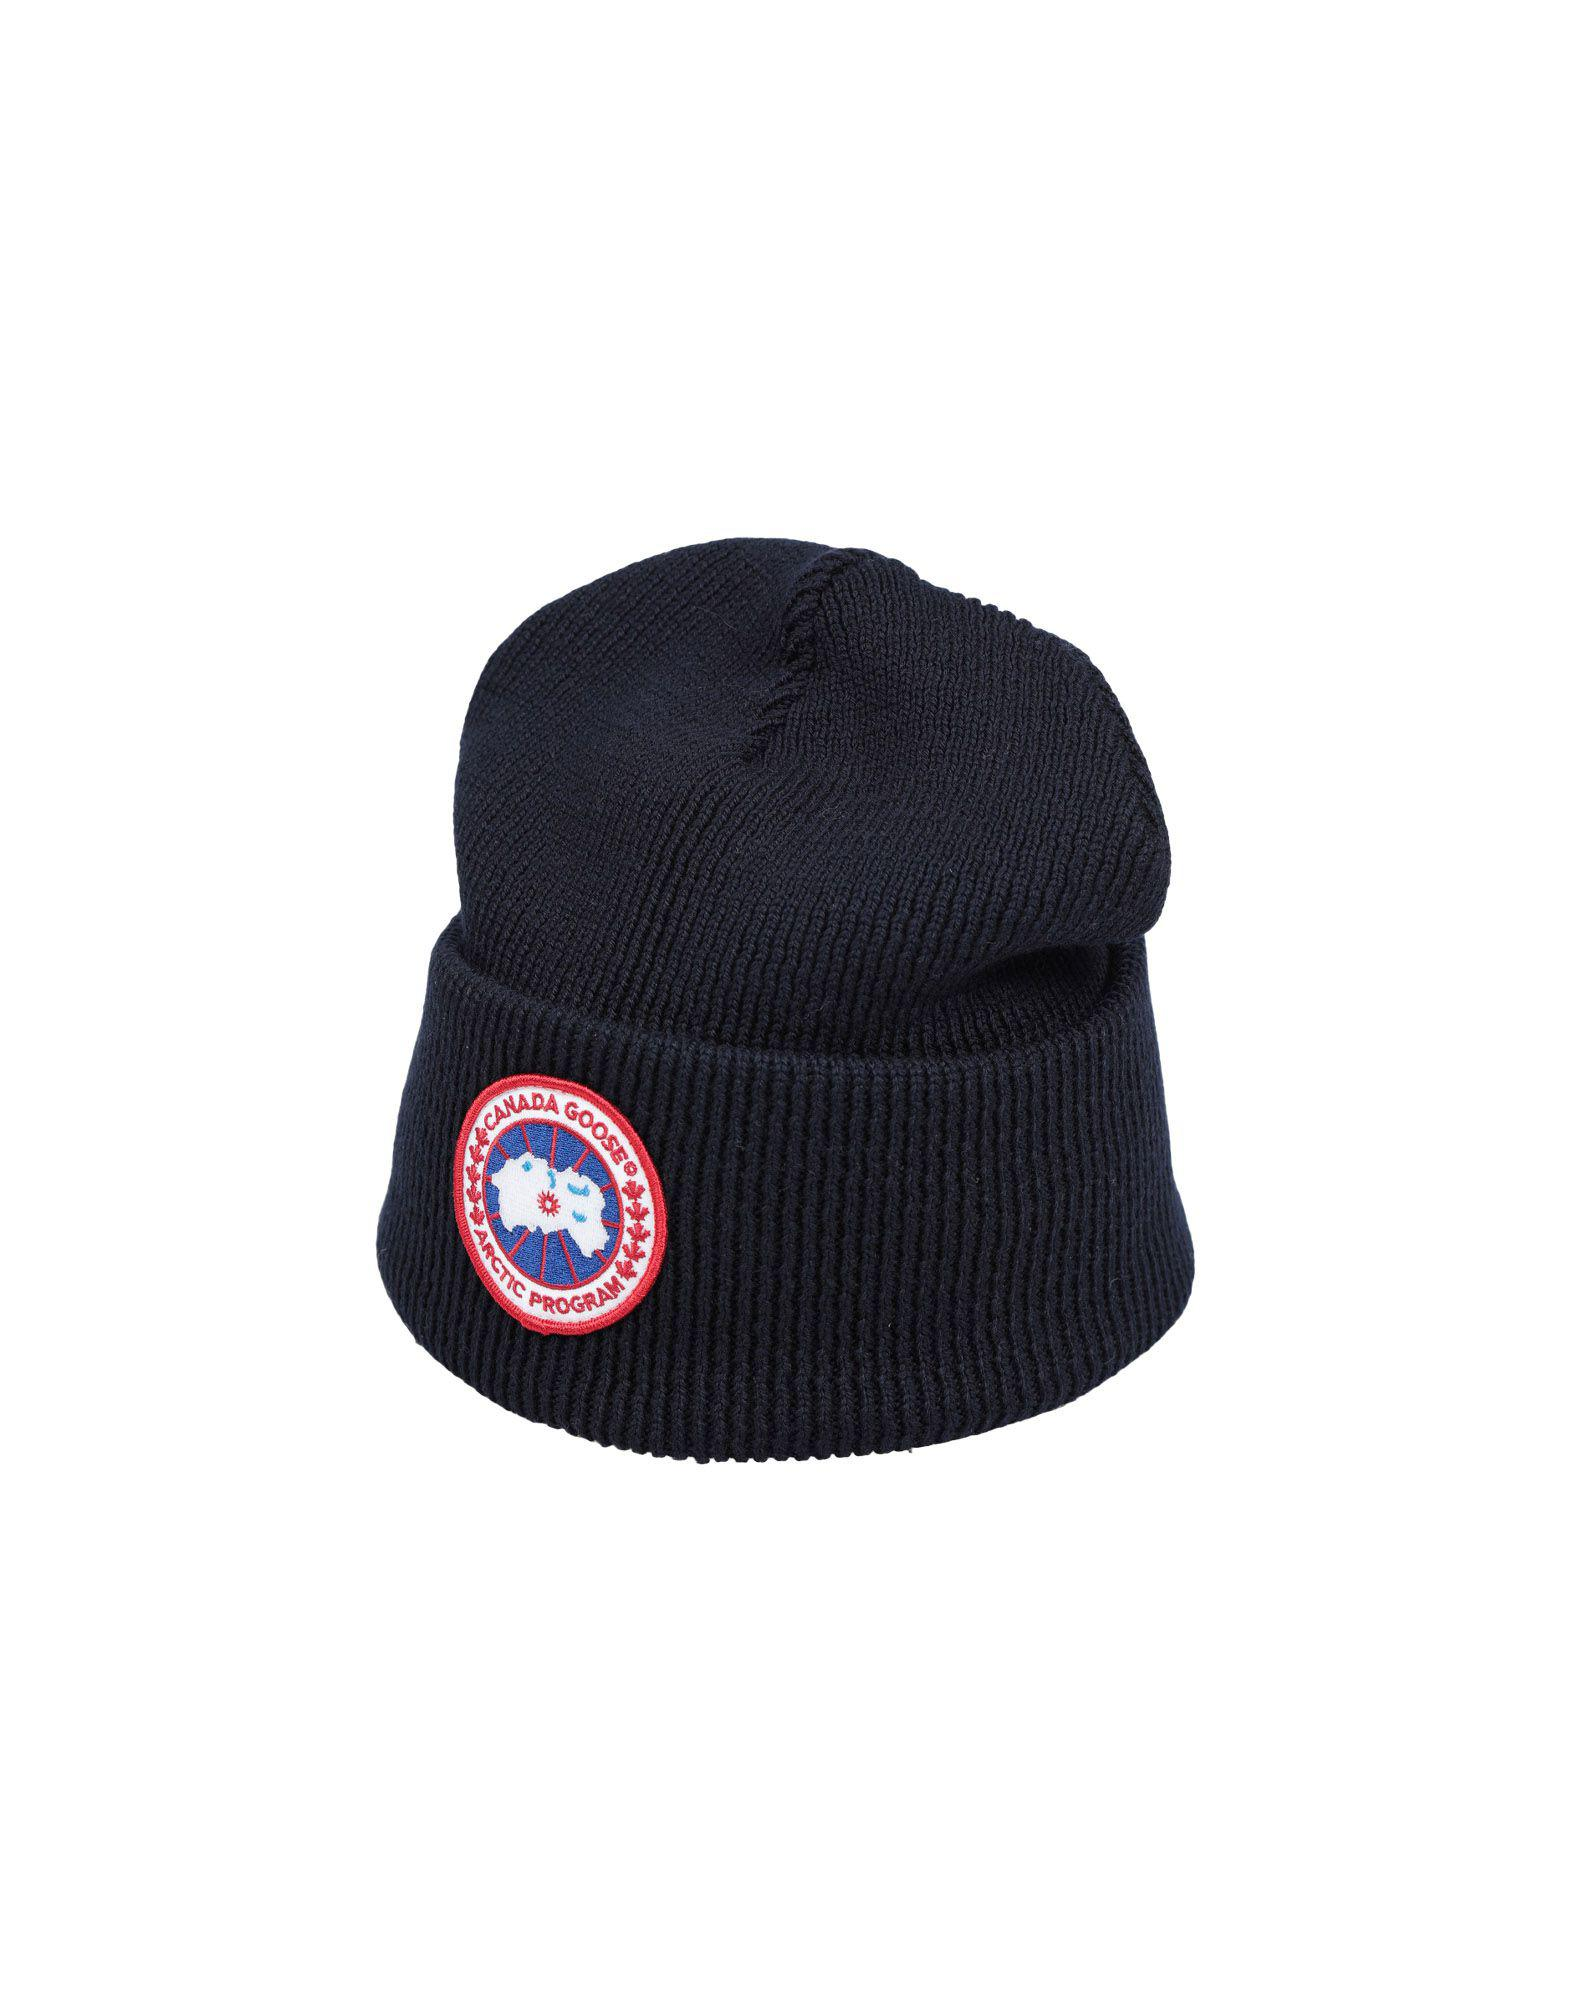 3ddd58f735f Lyst - Canada Goose Hat in Blue for Men